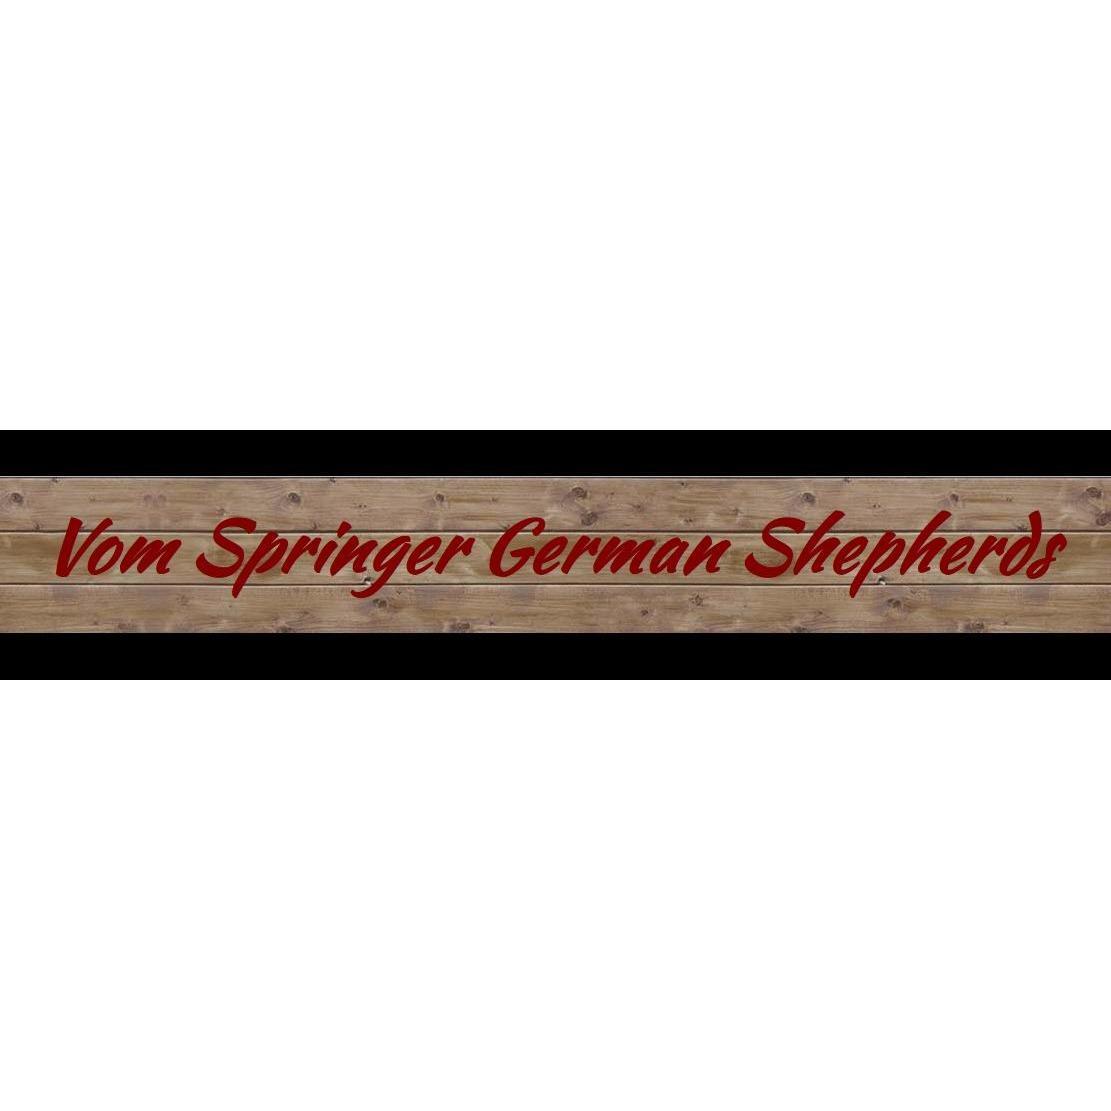 Vom Springer German Shepherds image 17